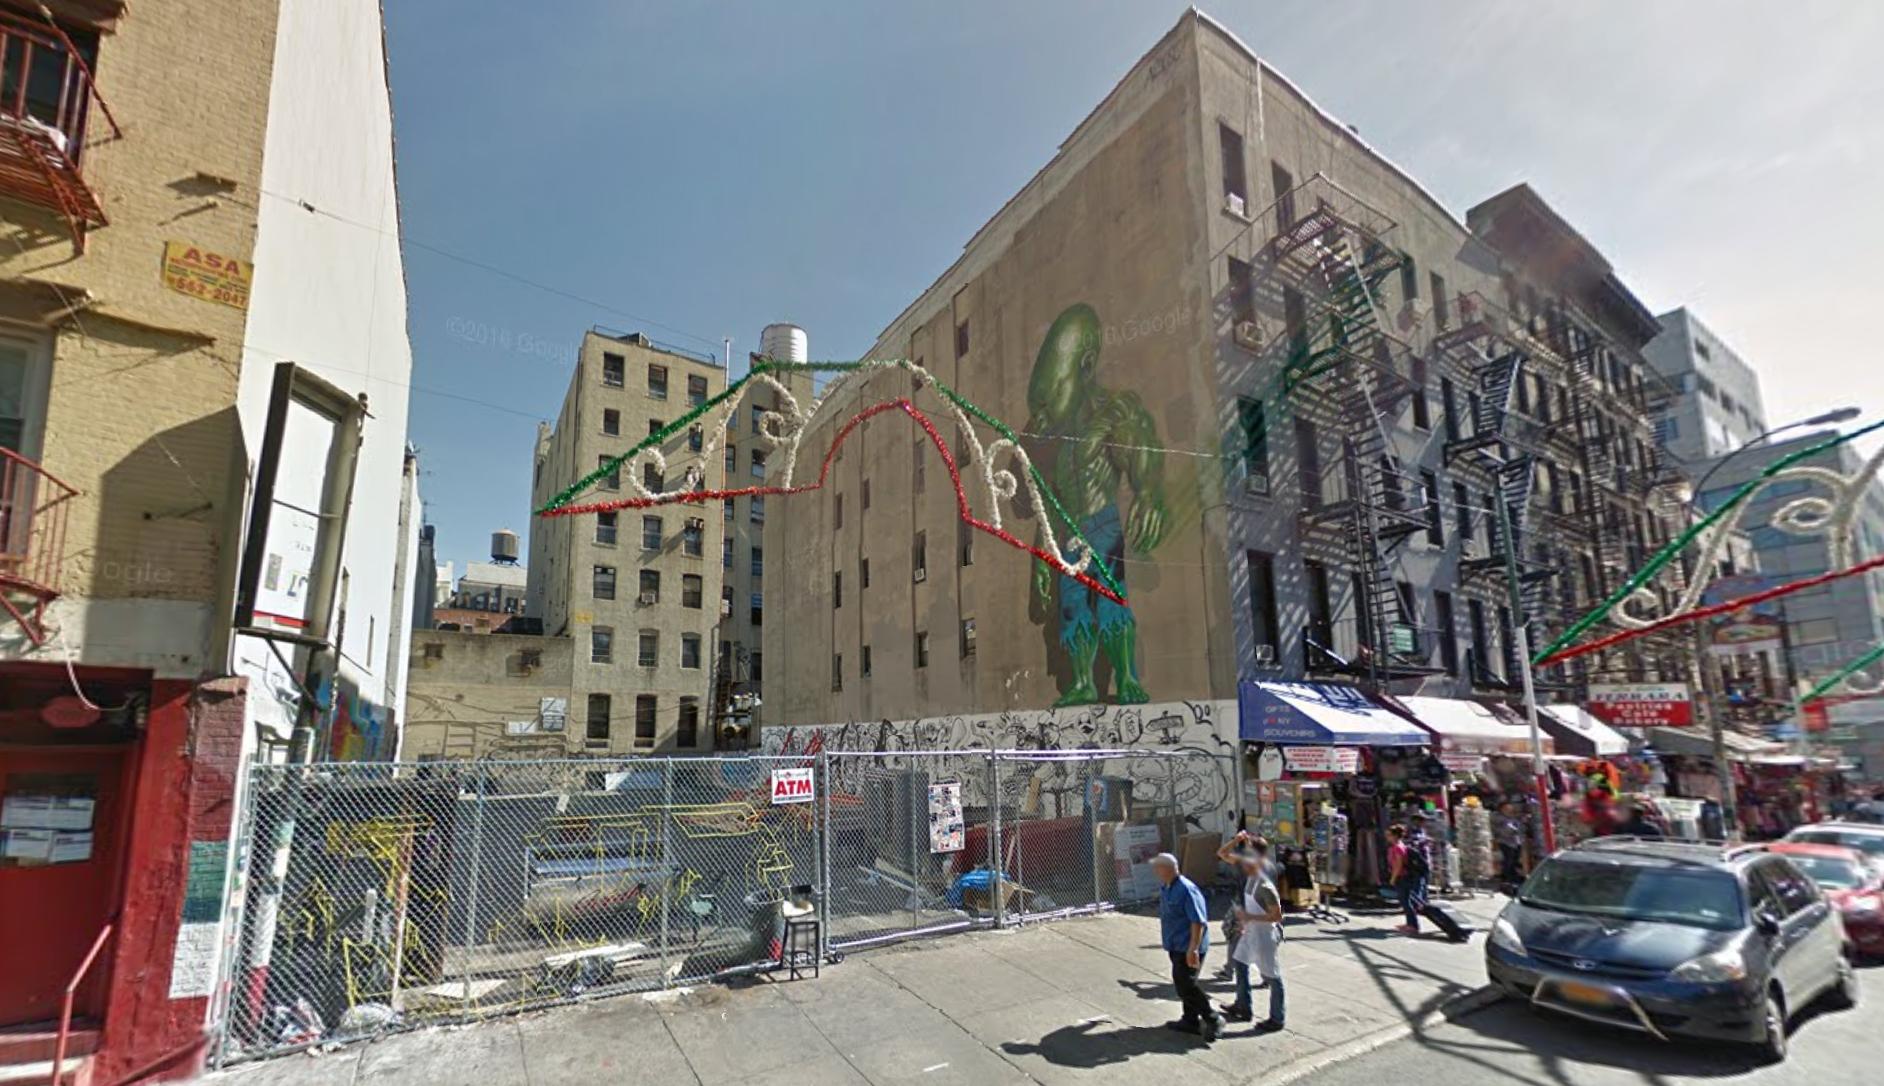 114 Mulberry Street, image via Google Maps